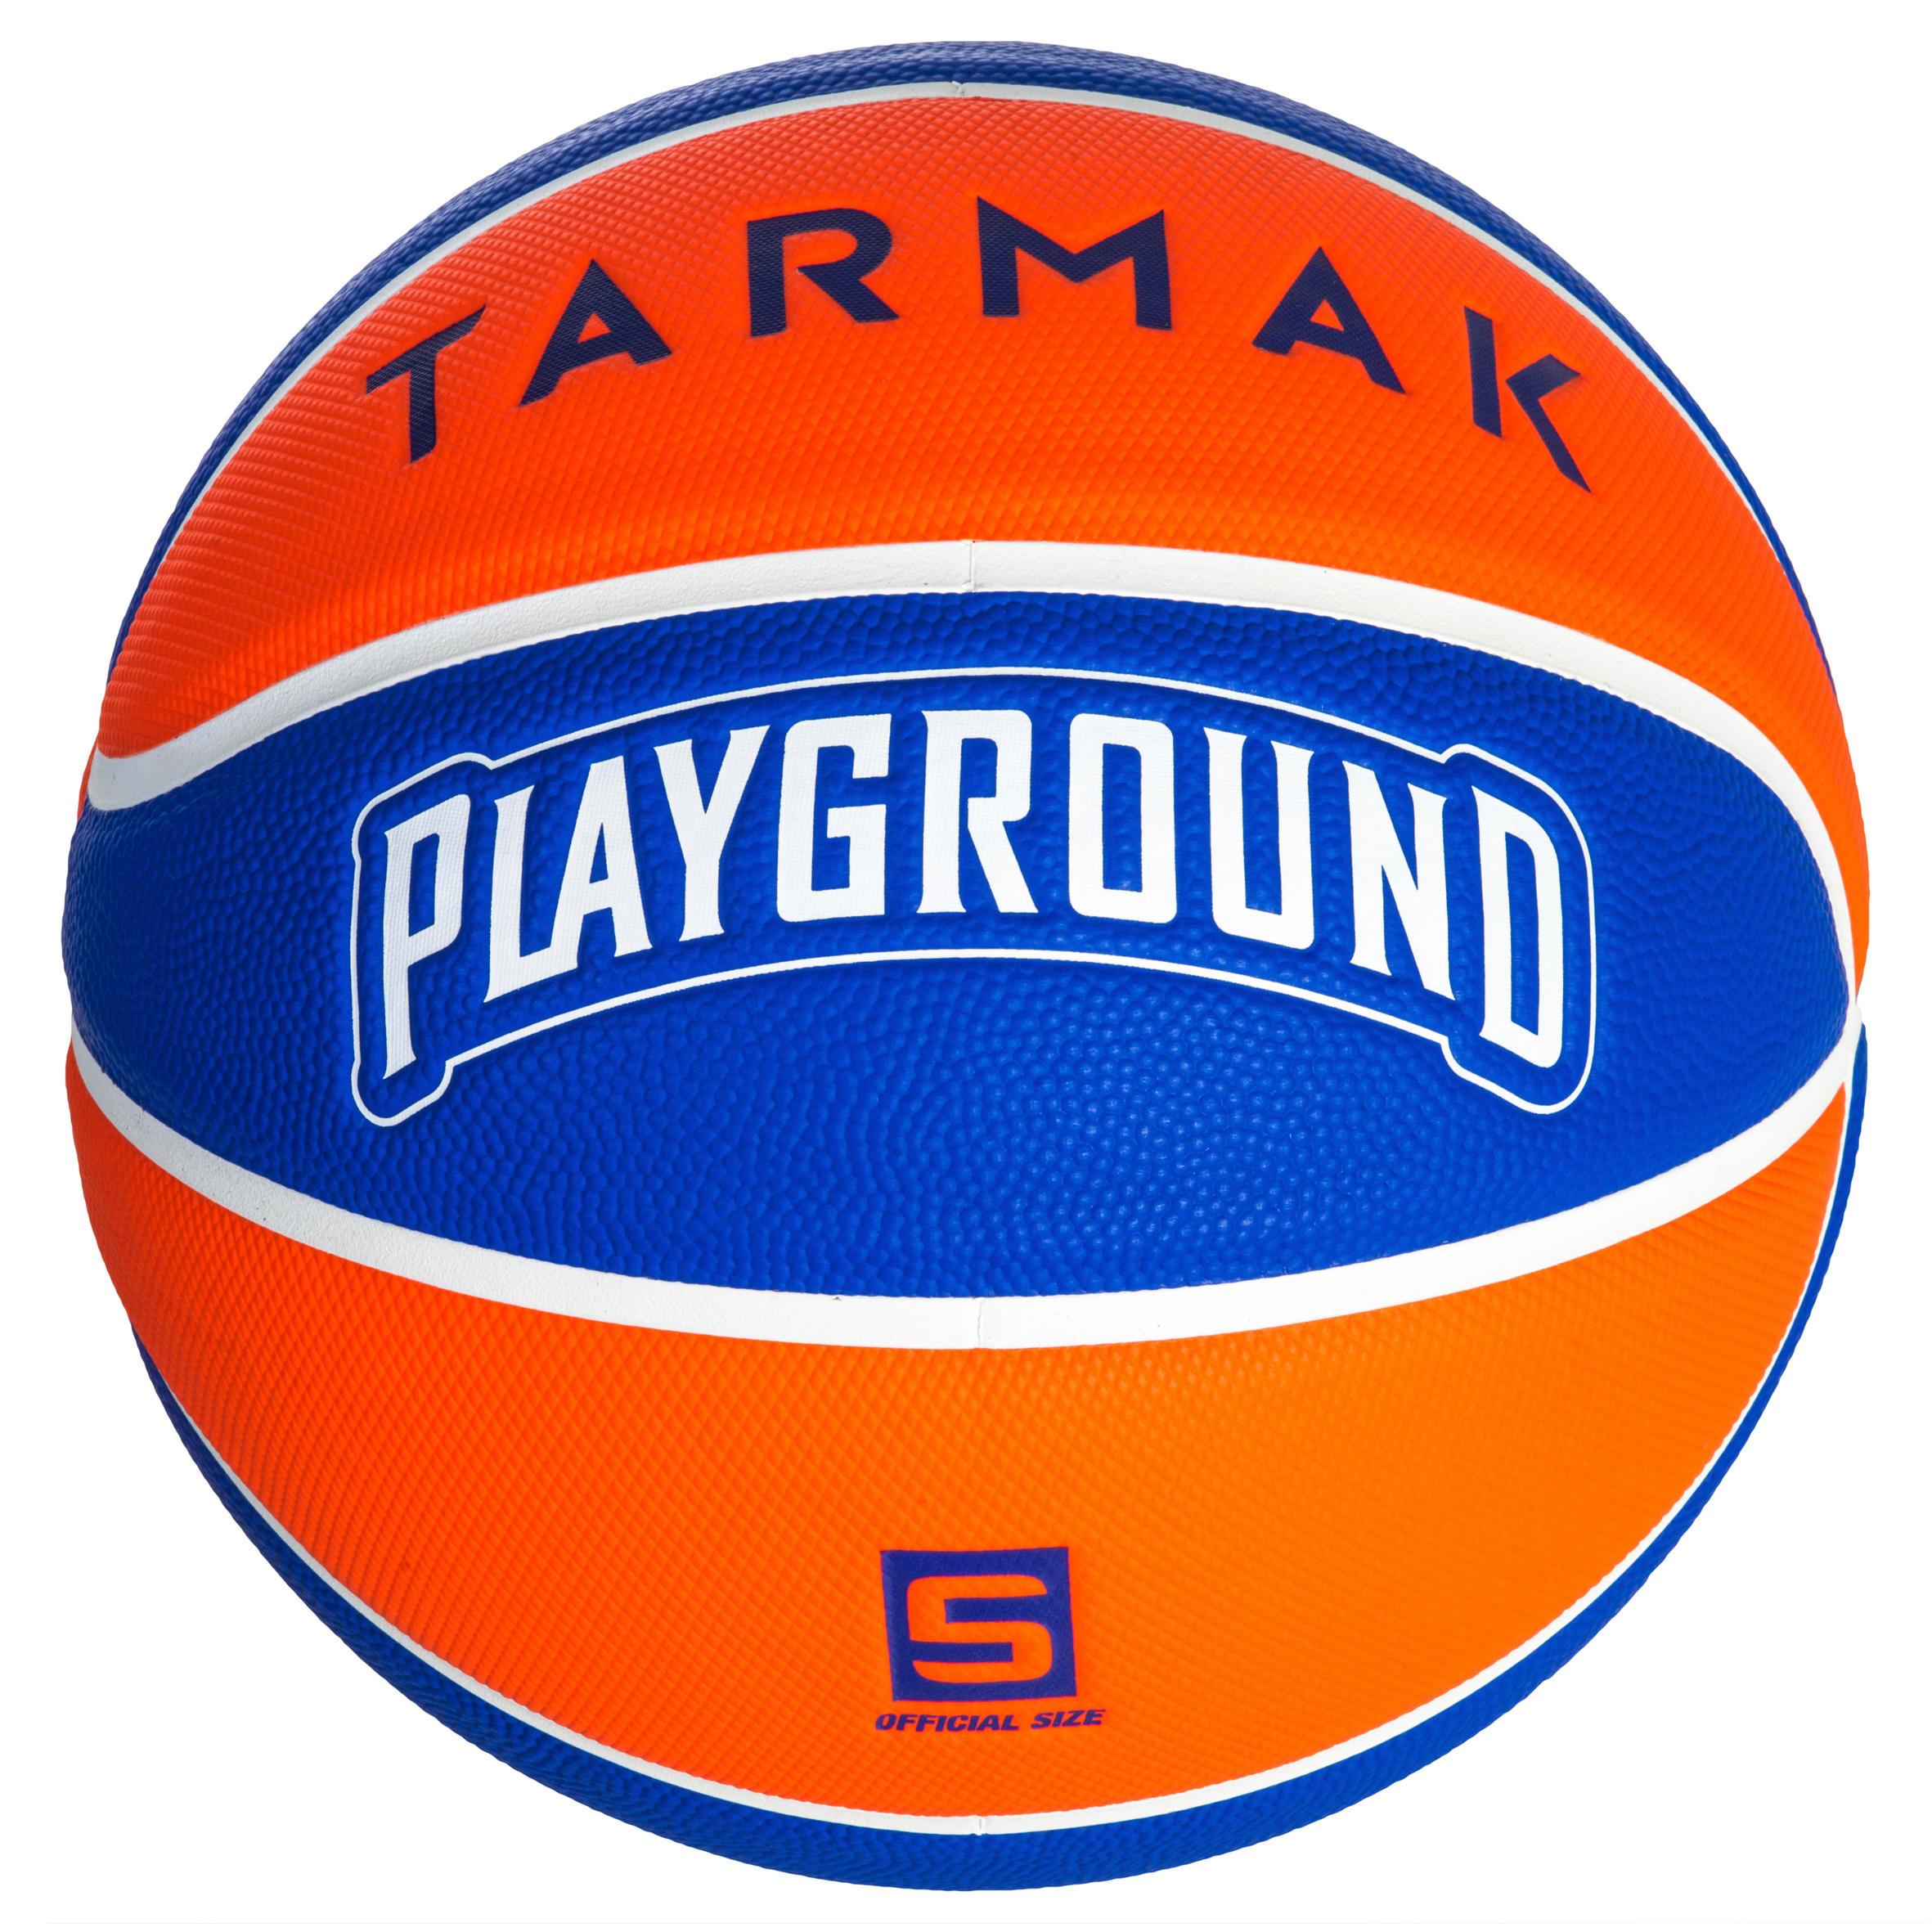 Wizzy Playground Kids' Size 5 Basketball - Blue/Orange Up to 10 years.